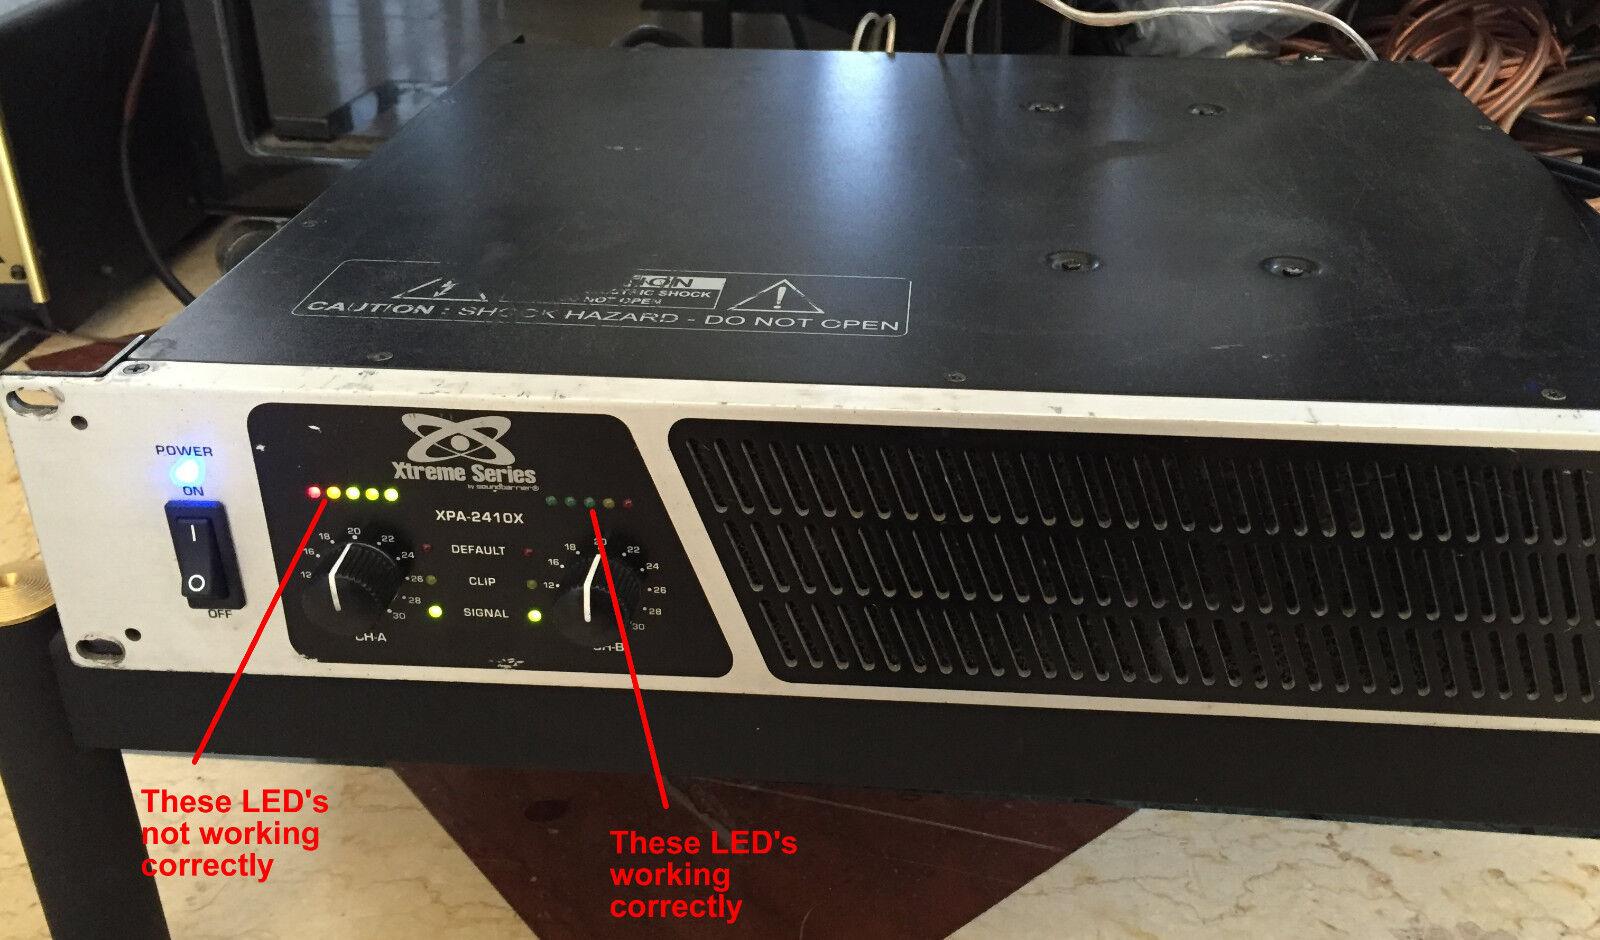 Xtreme Series by Soundbarrier Model XPA-2410x Professional Amplifier